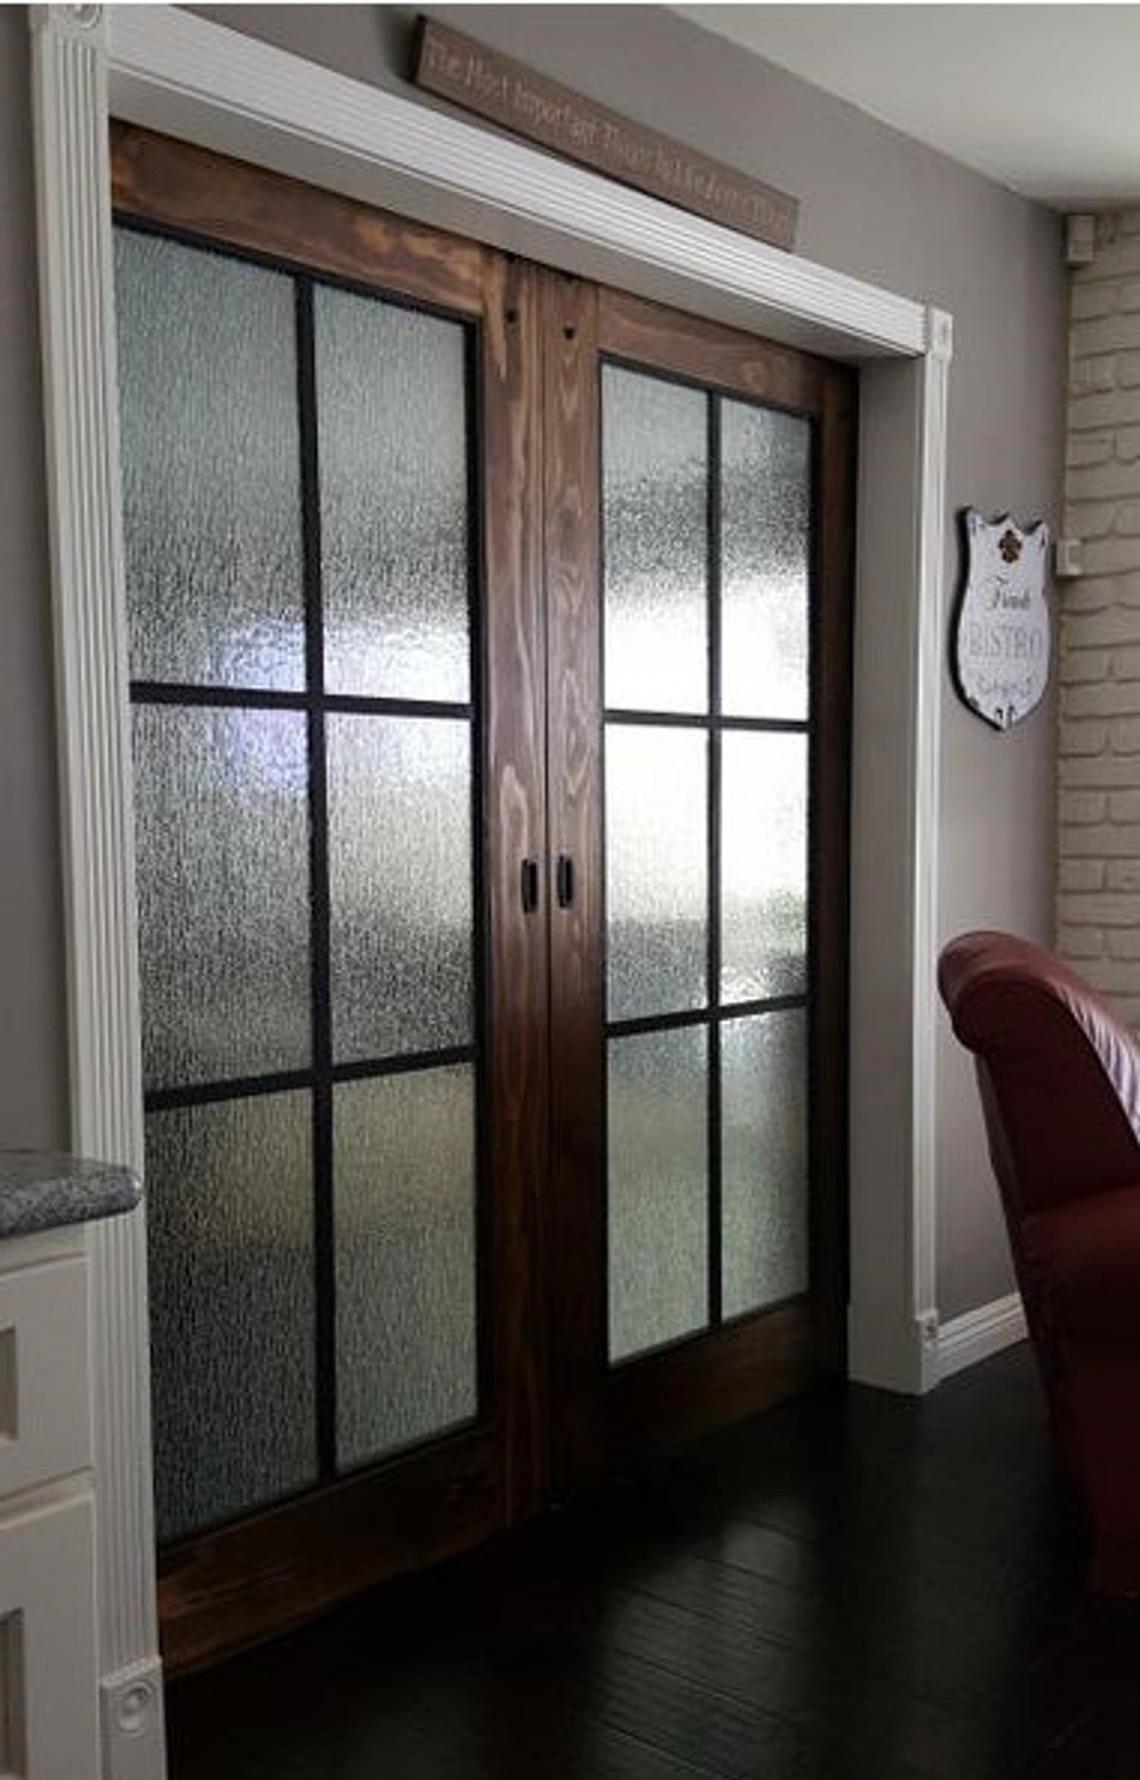 Sliding Barn Door For Bathroom Sliding Barn Doors For Windows Black Interior Doors 20190418 Glass Barn Doors French Doors Interior Barn Doors Sliding